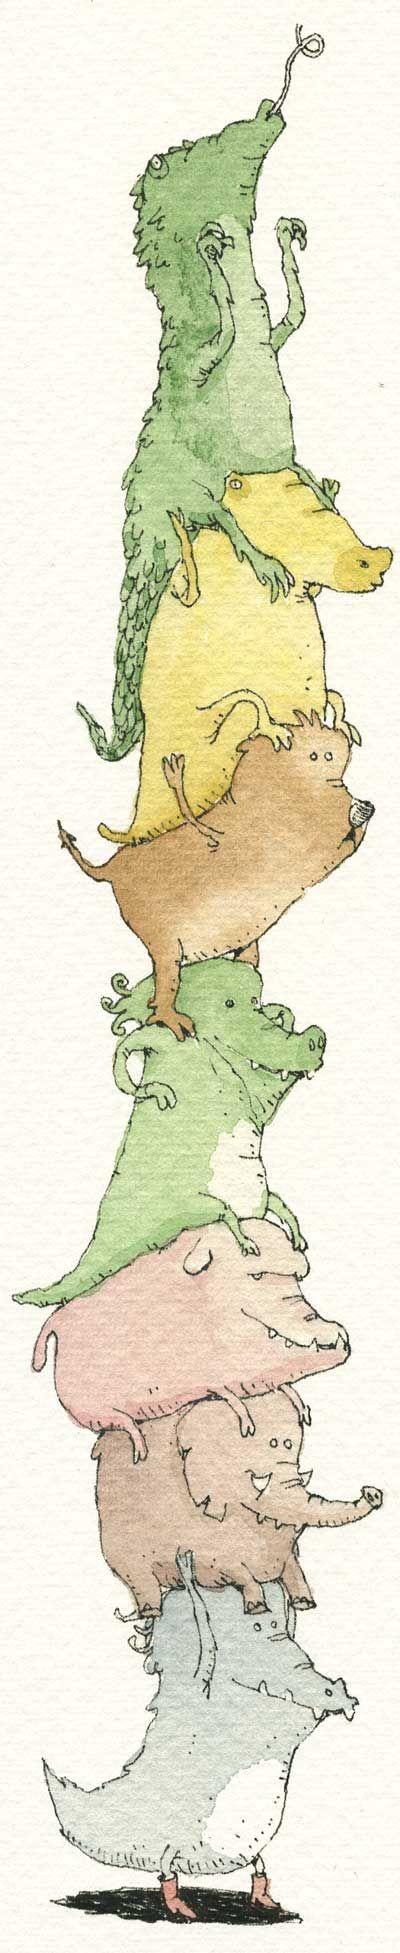 more matias adolfsson illustrations